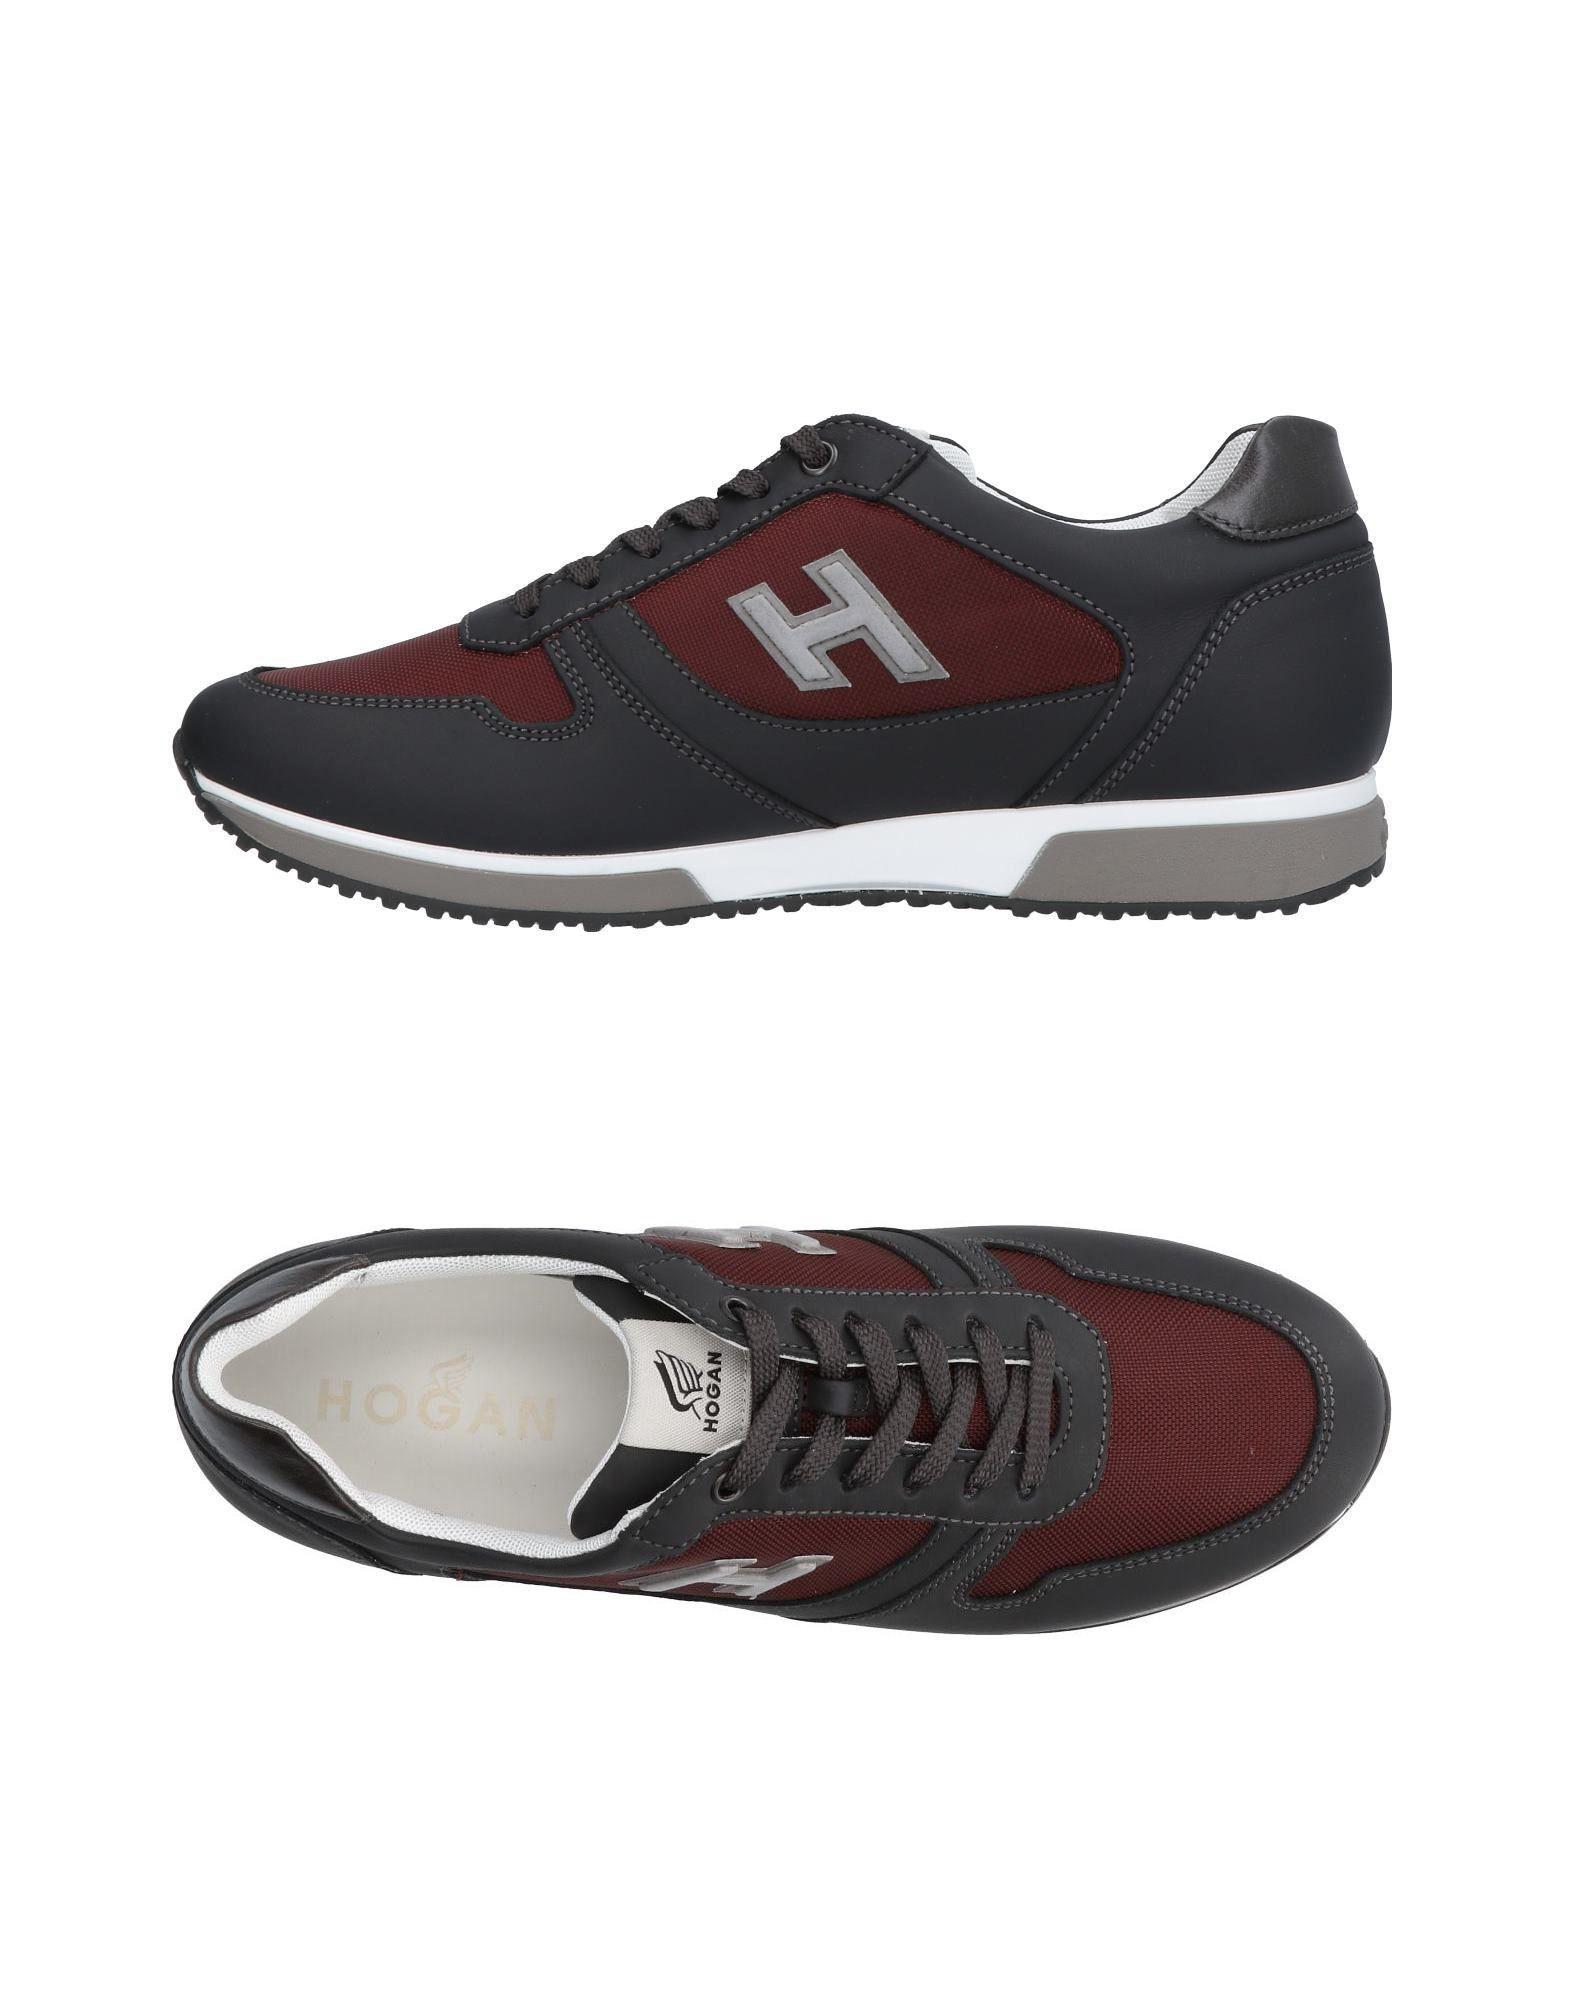 Hogan Sneakers Herren  11427066AB Gute Qualität beliebte Schuhe